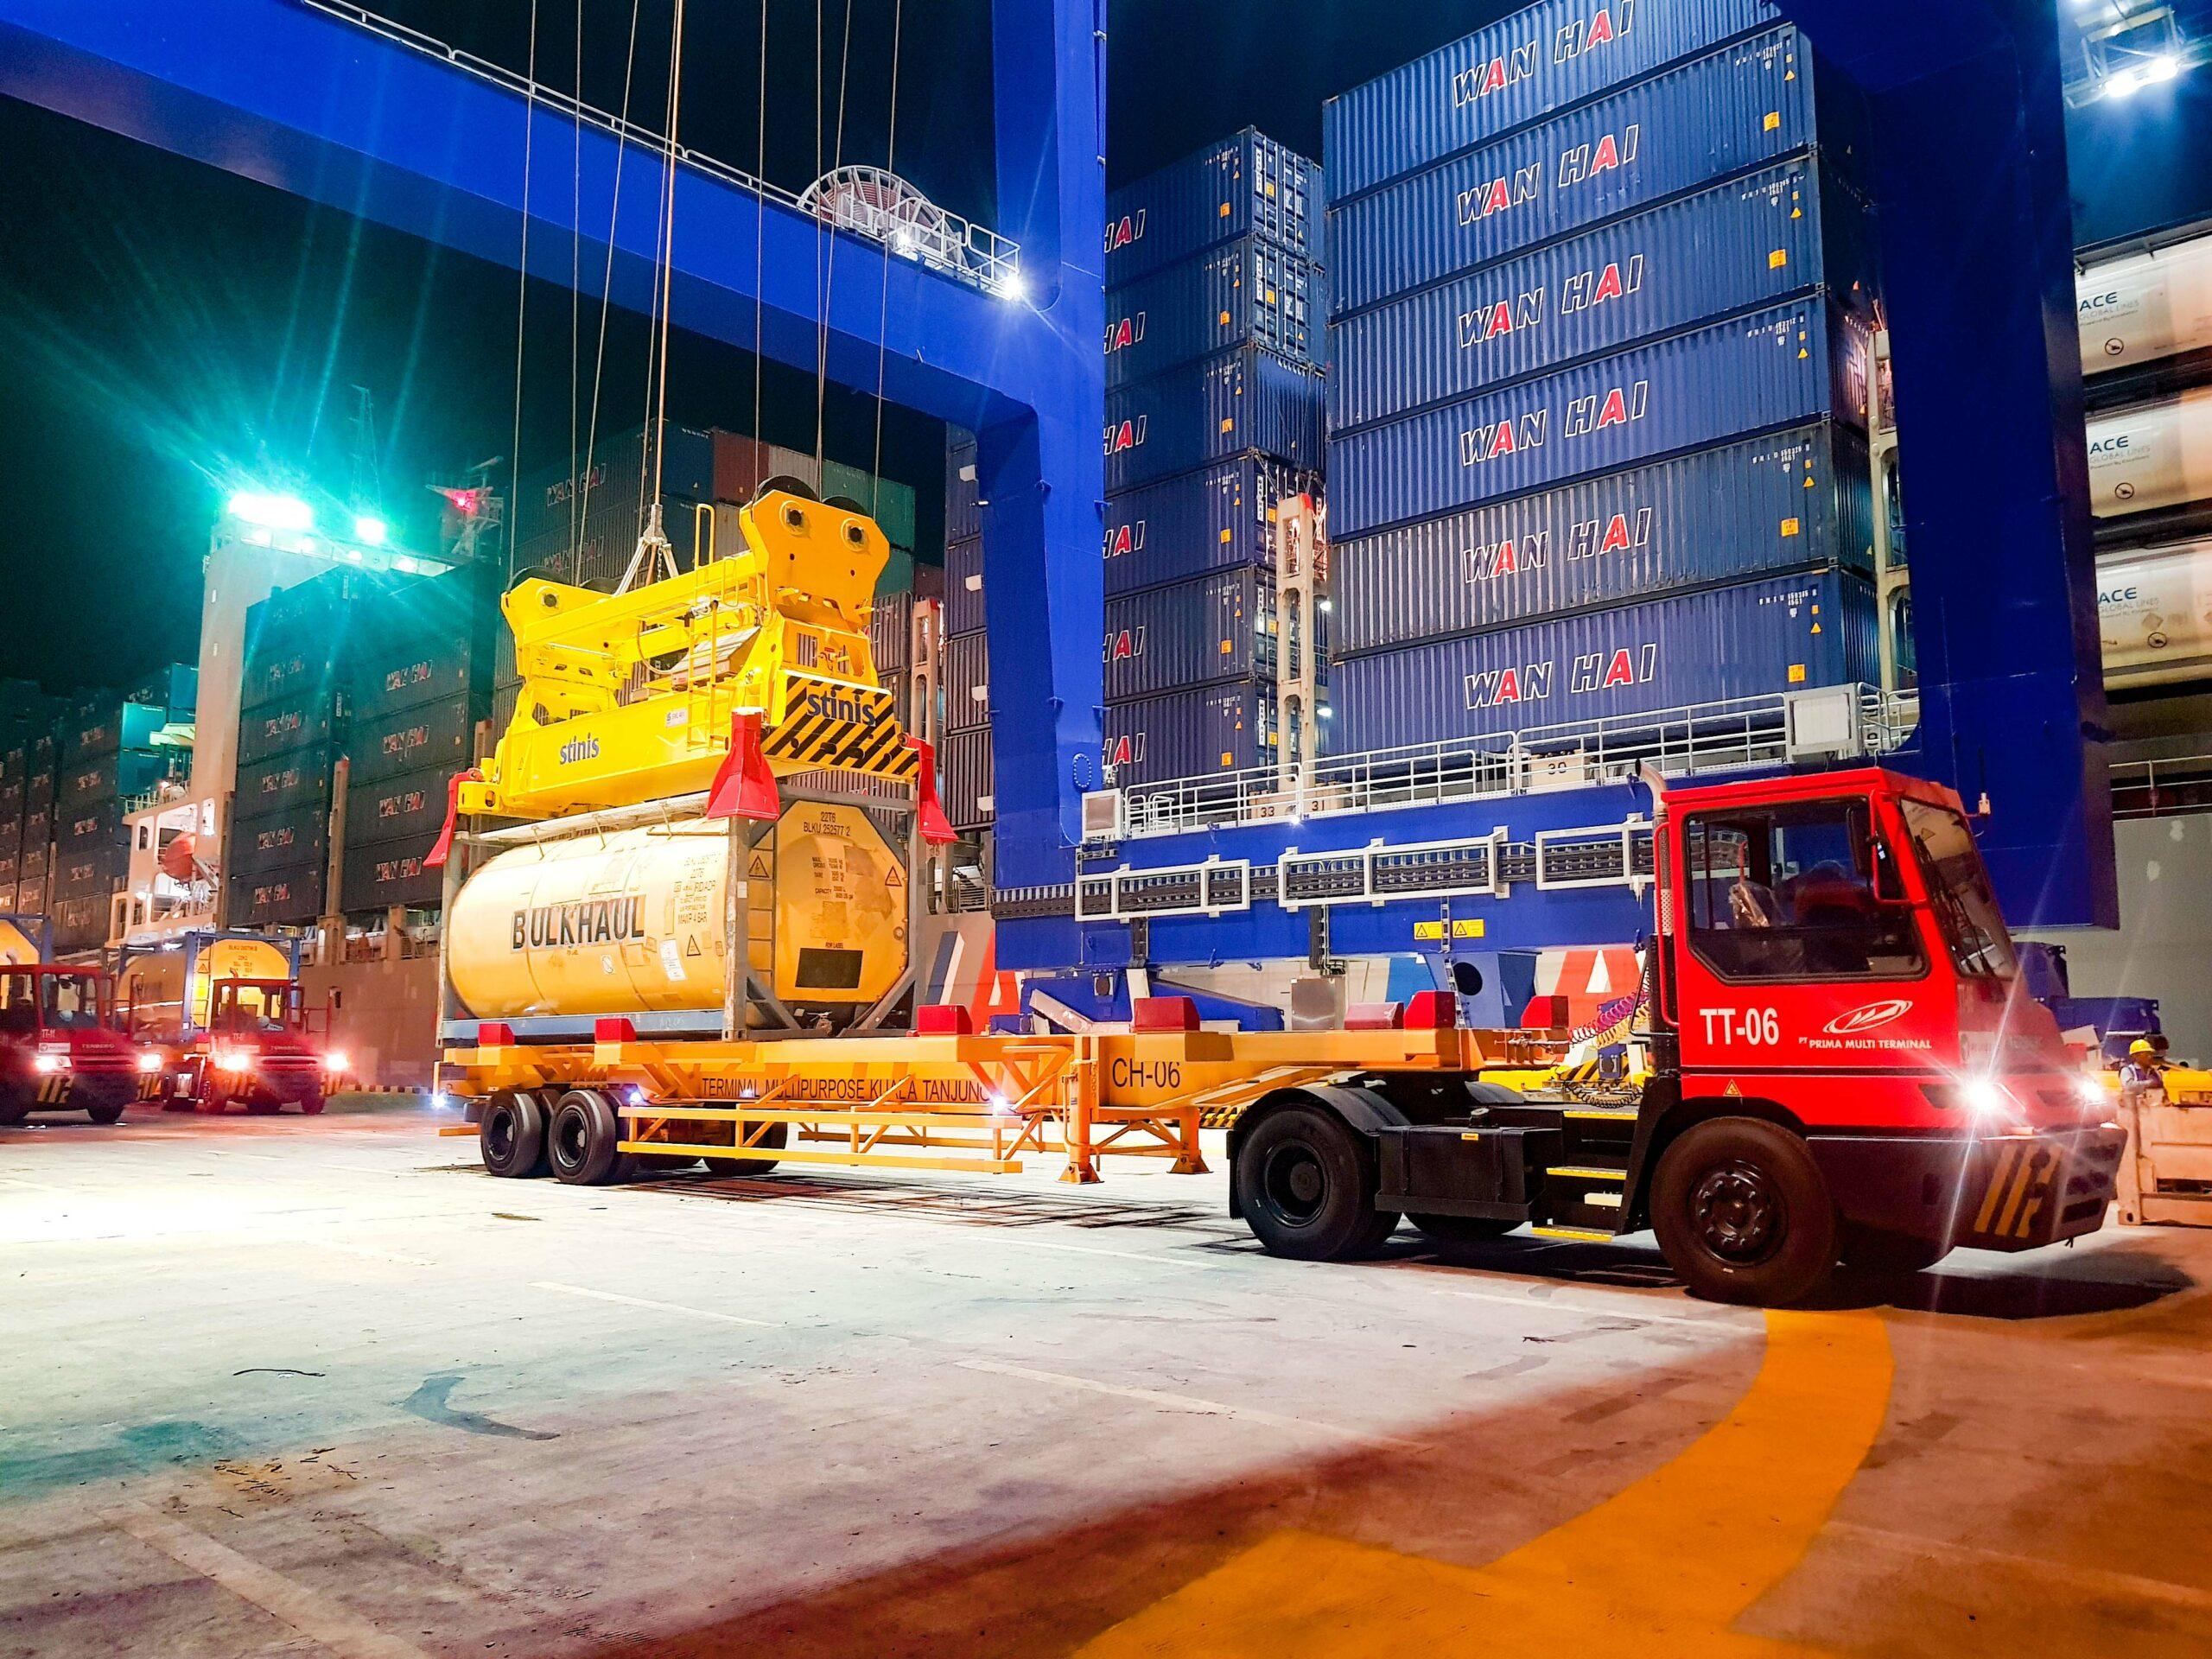 Wan Hai has scheduled buying of 12 new box ships 1